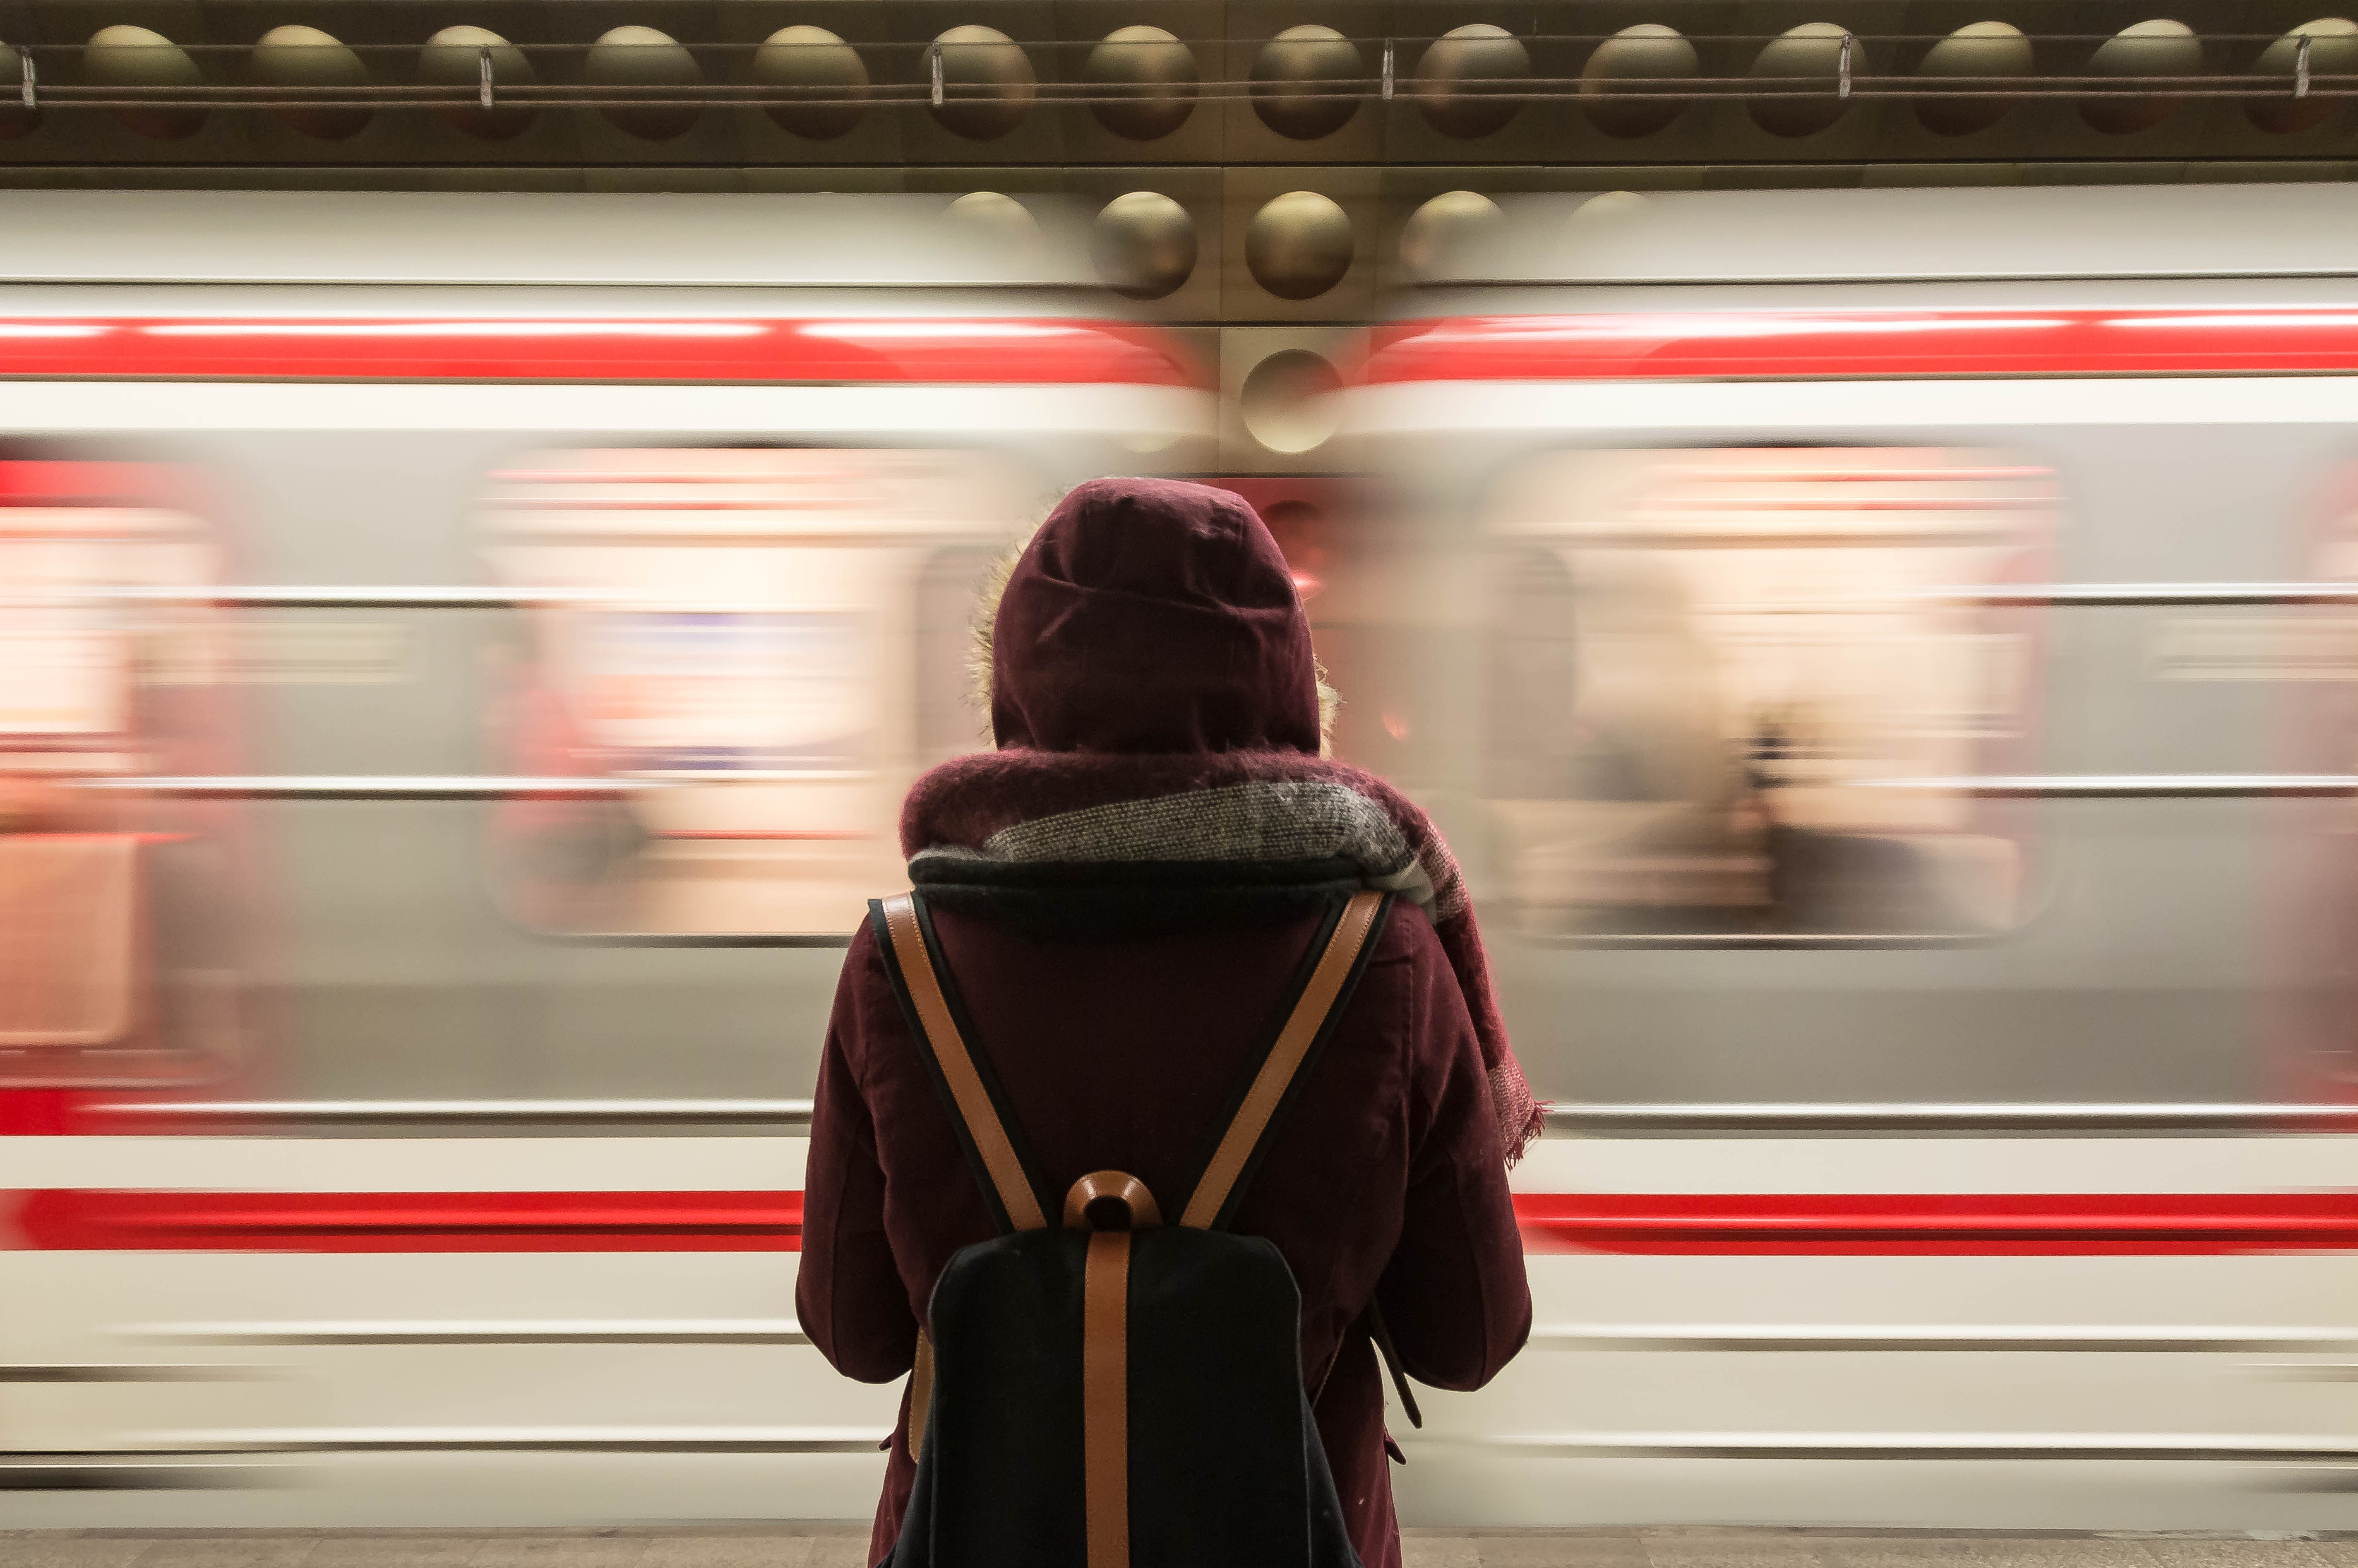 Train passing a passenger by (Photo by Fabrizio Verrecchia on Unsplash)